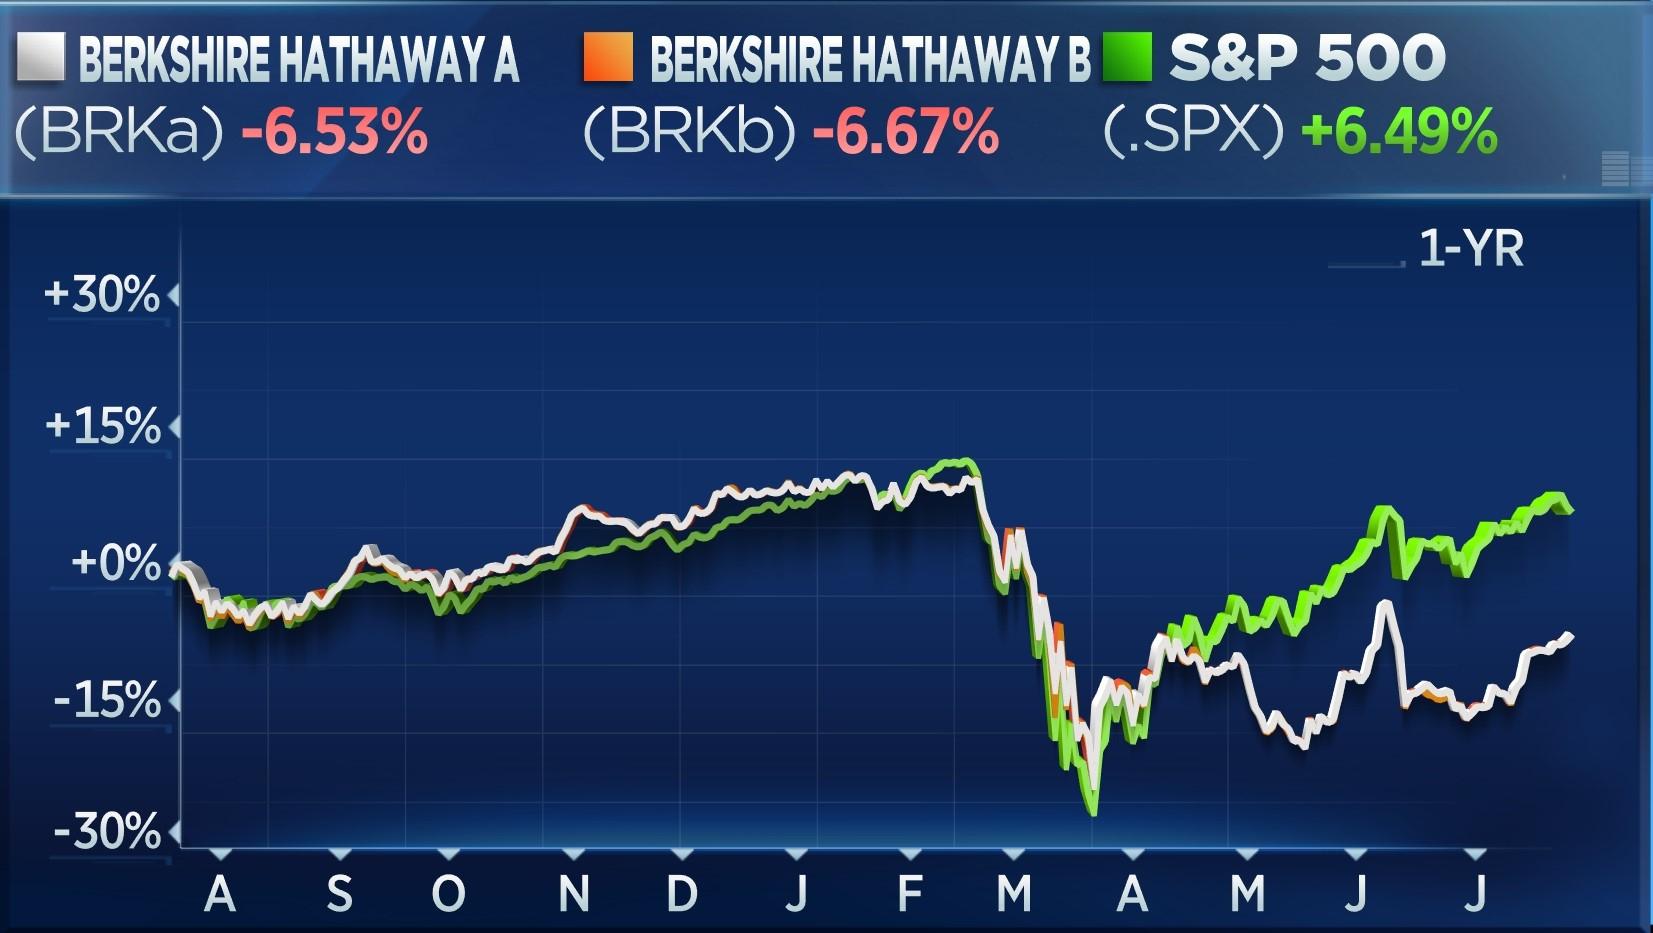 BRKA vs BRKB vs S&P - 1 year